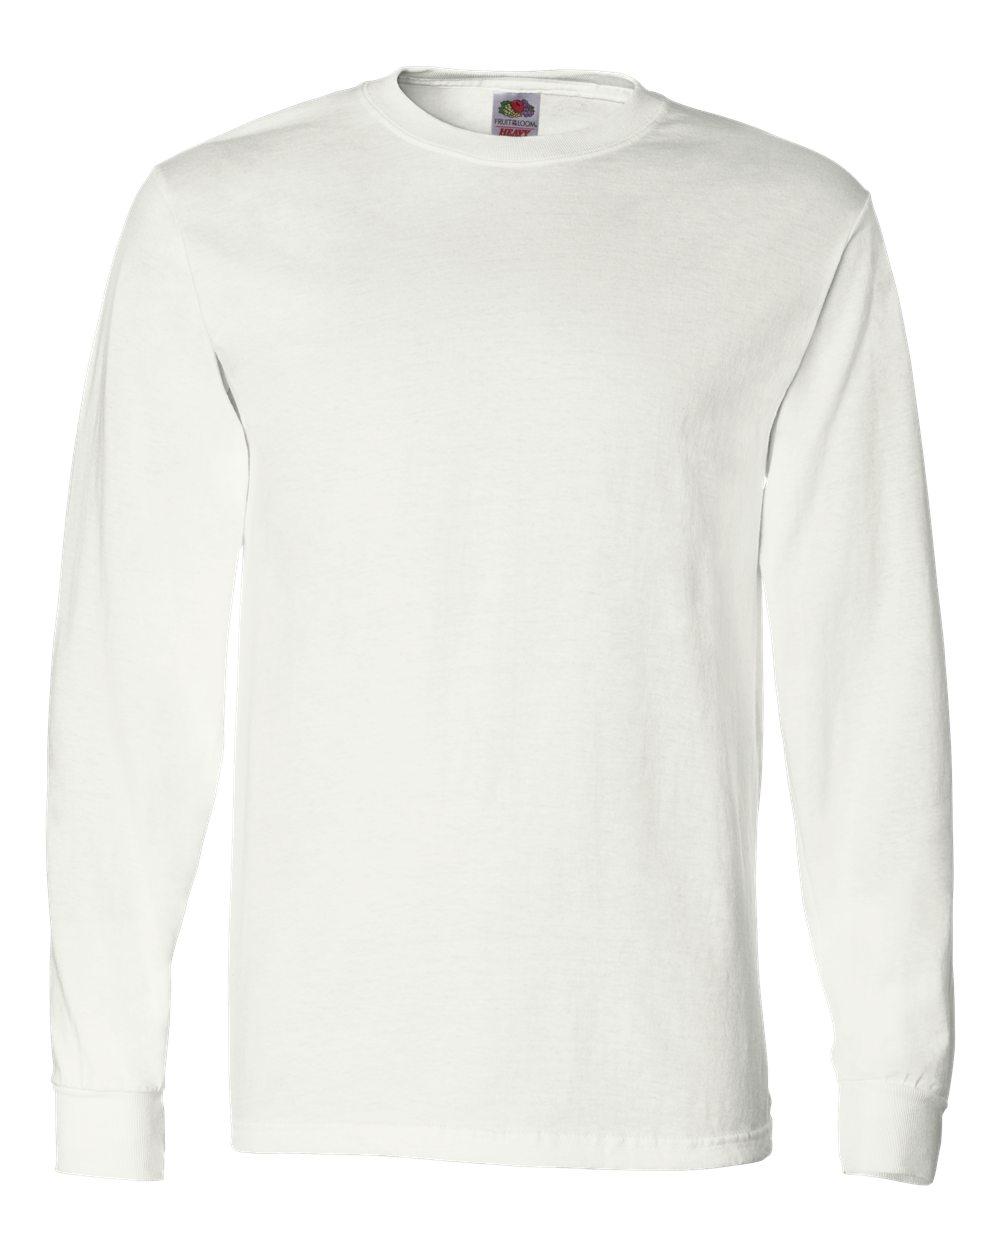 bf85d6babfb7 Fruit Of The Loom HD Cotton Long Sleeve T-Shirt | Entripy